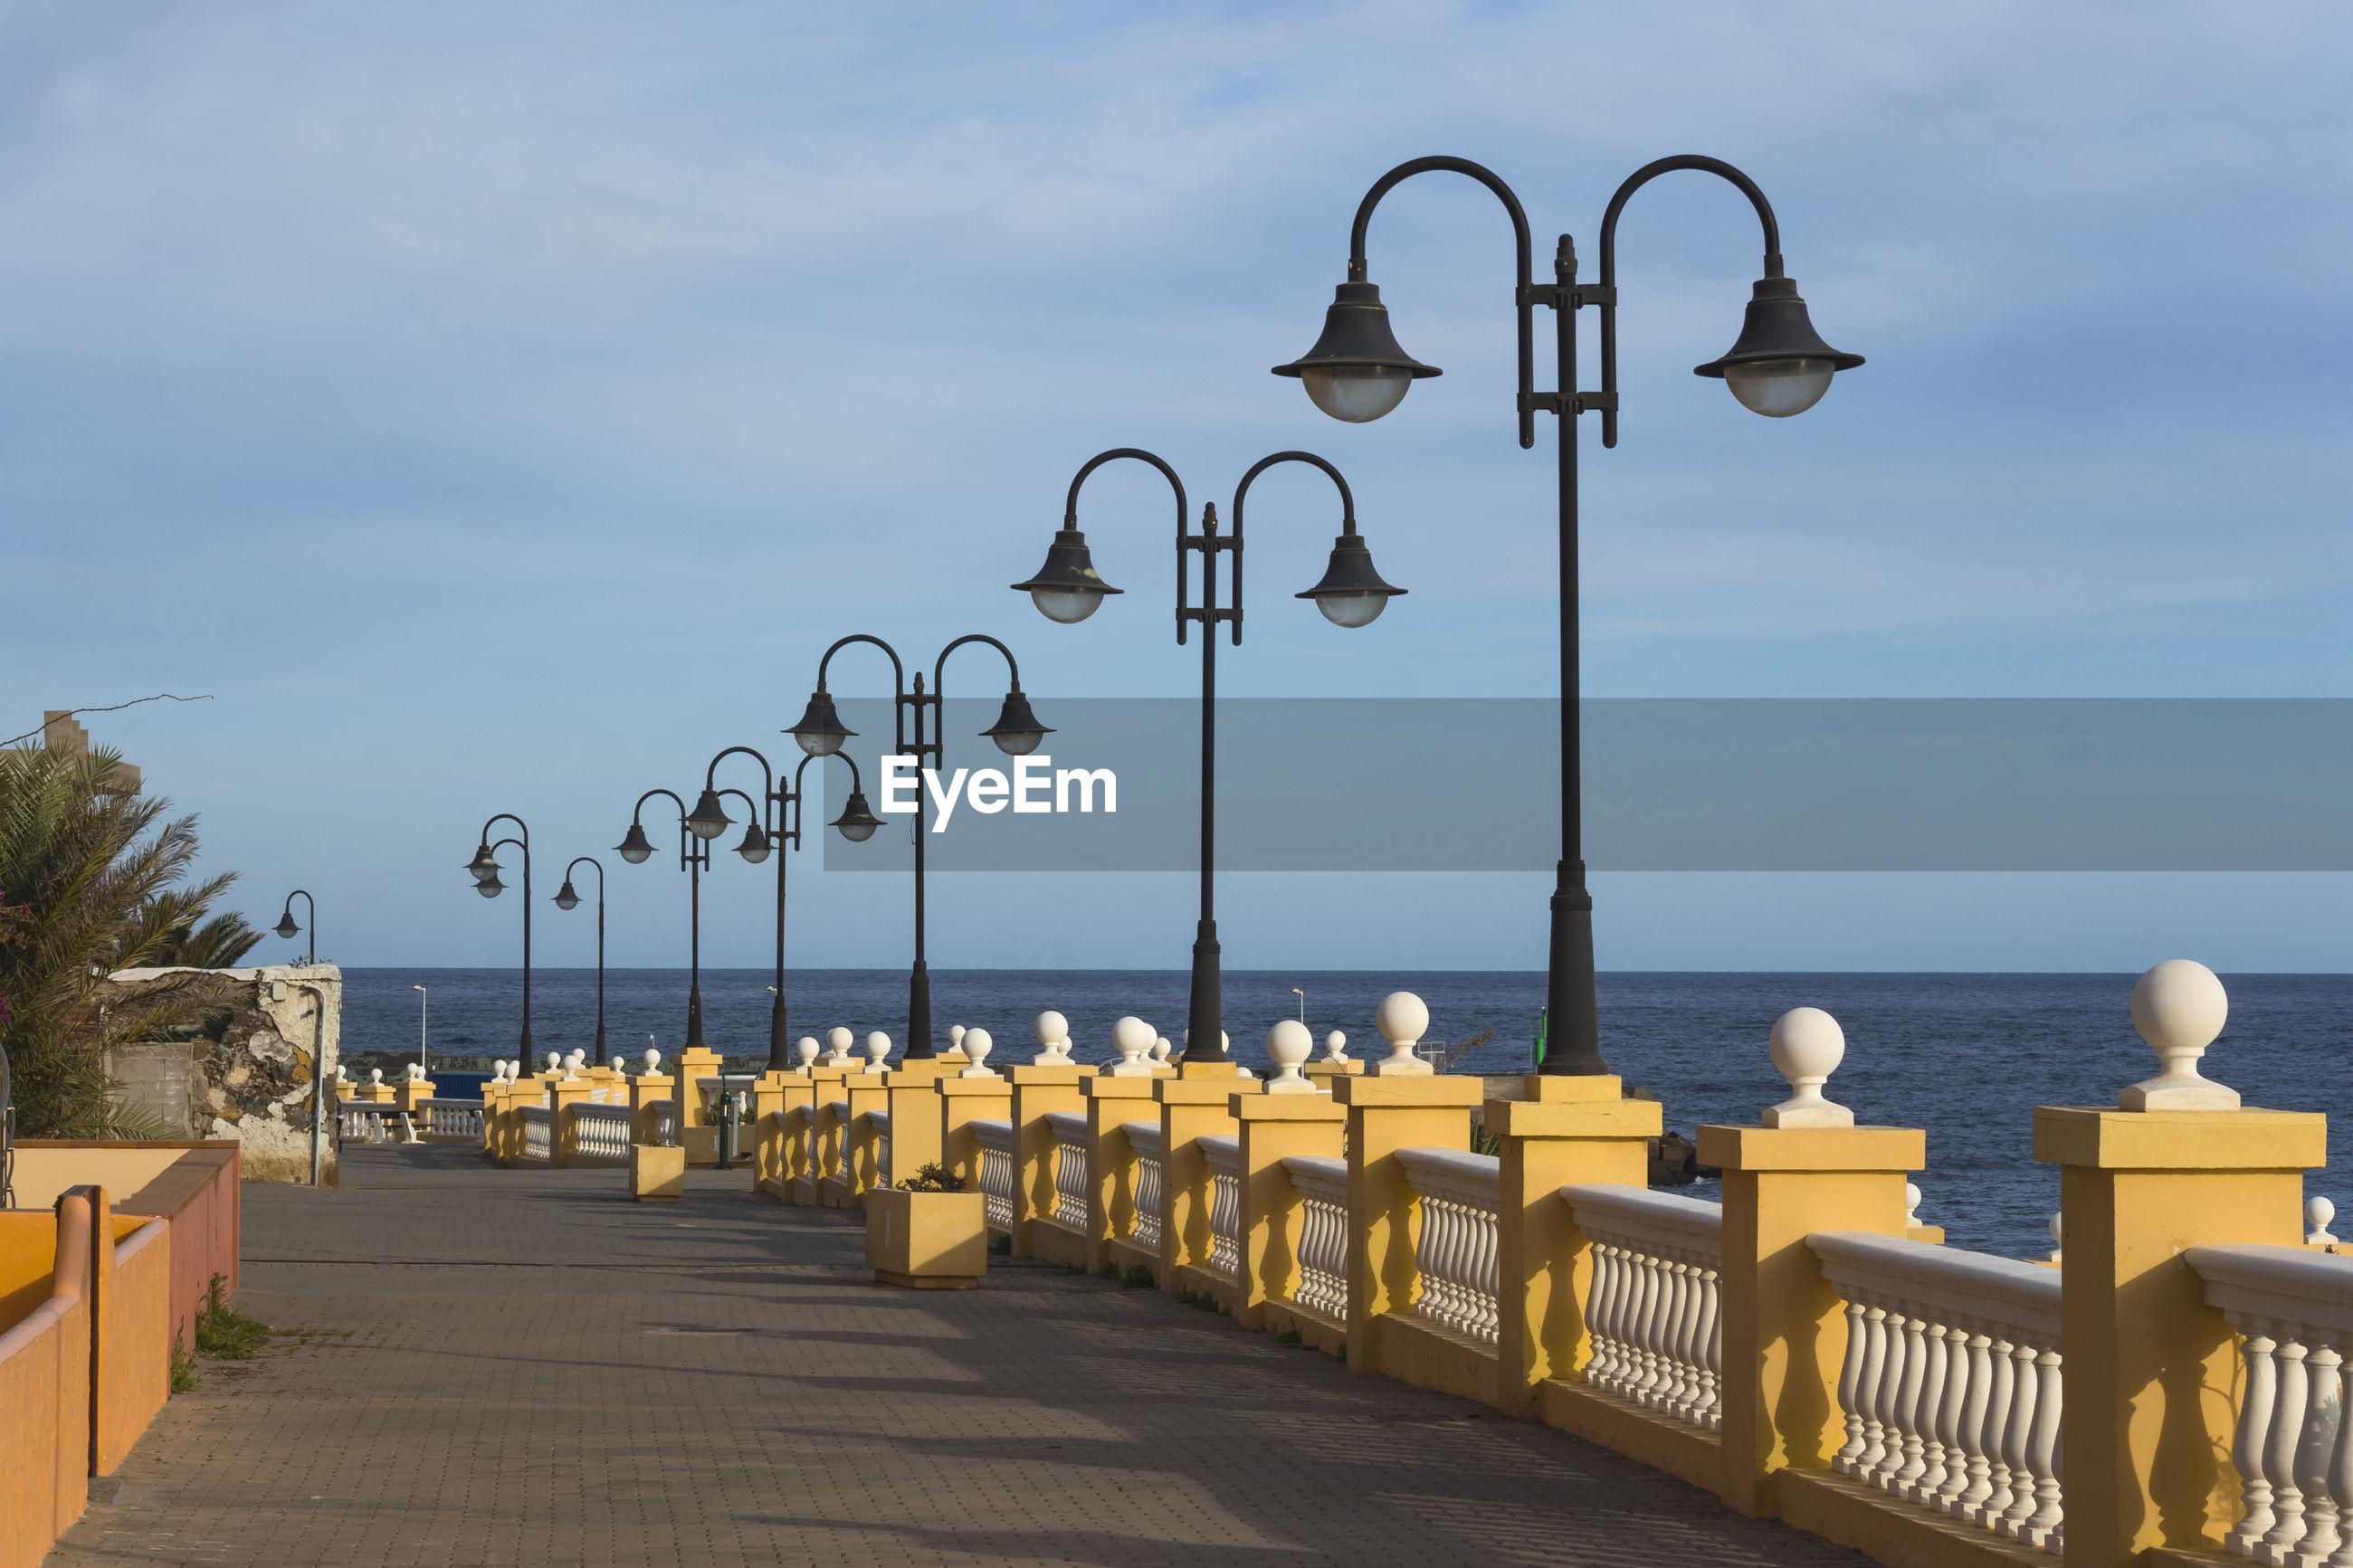 STREET LIGHTS BY SEA AGAINST SKY AT BEACH